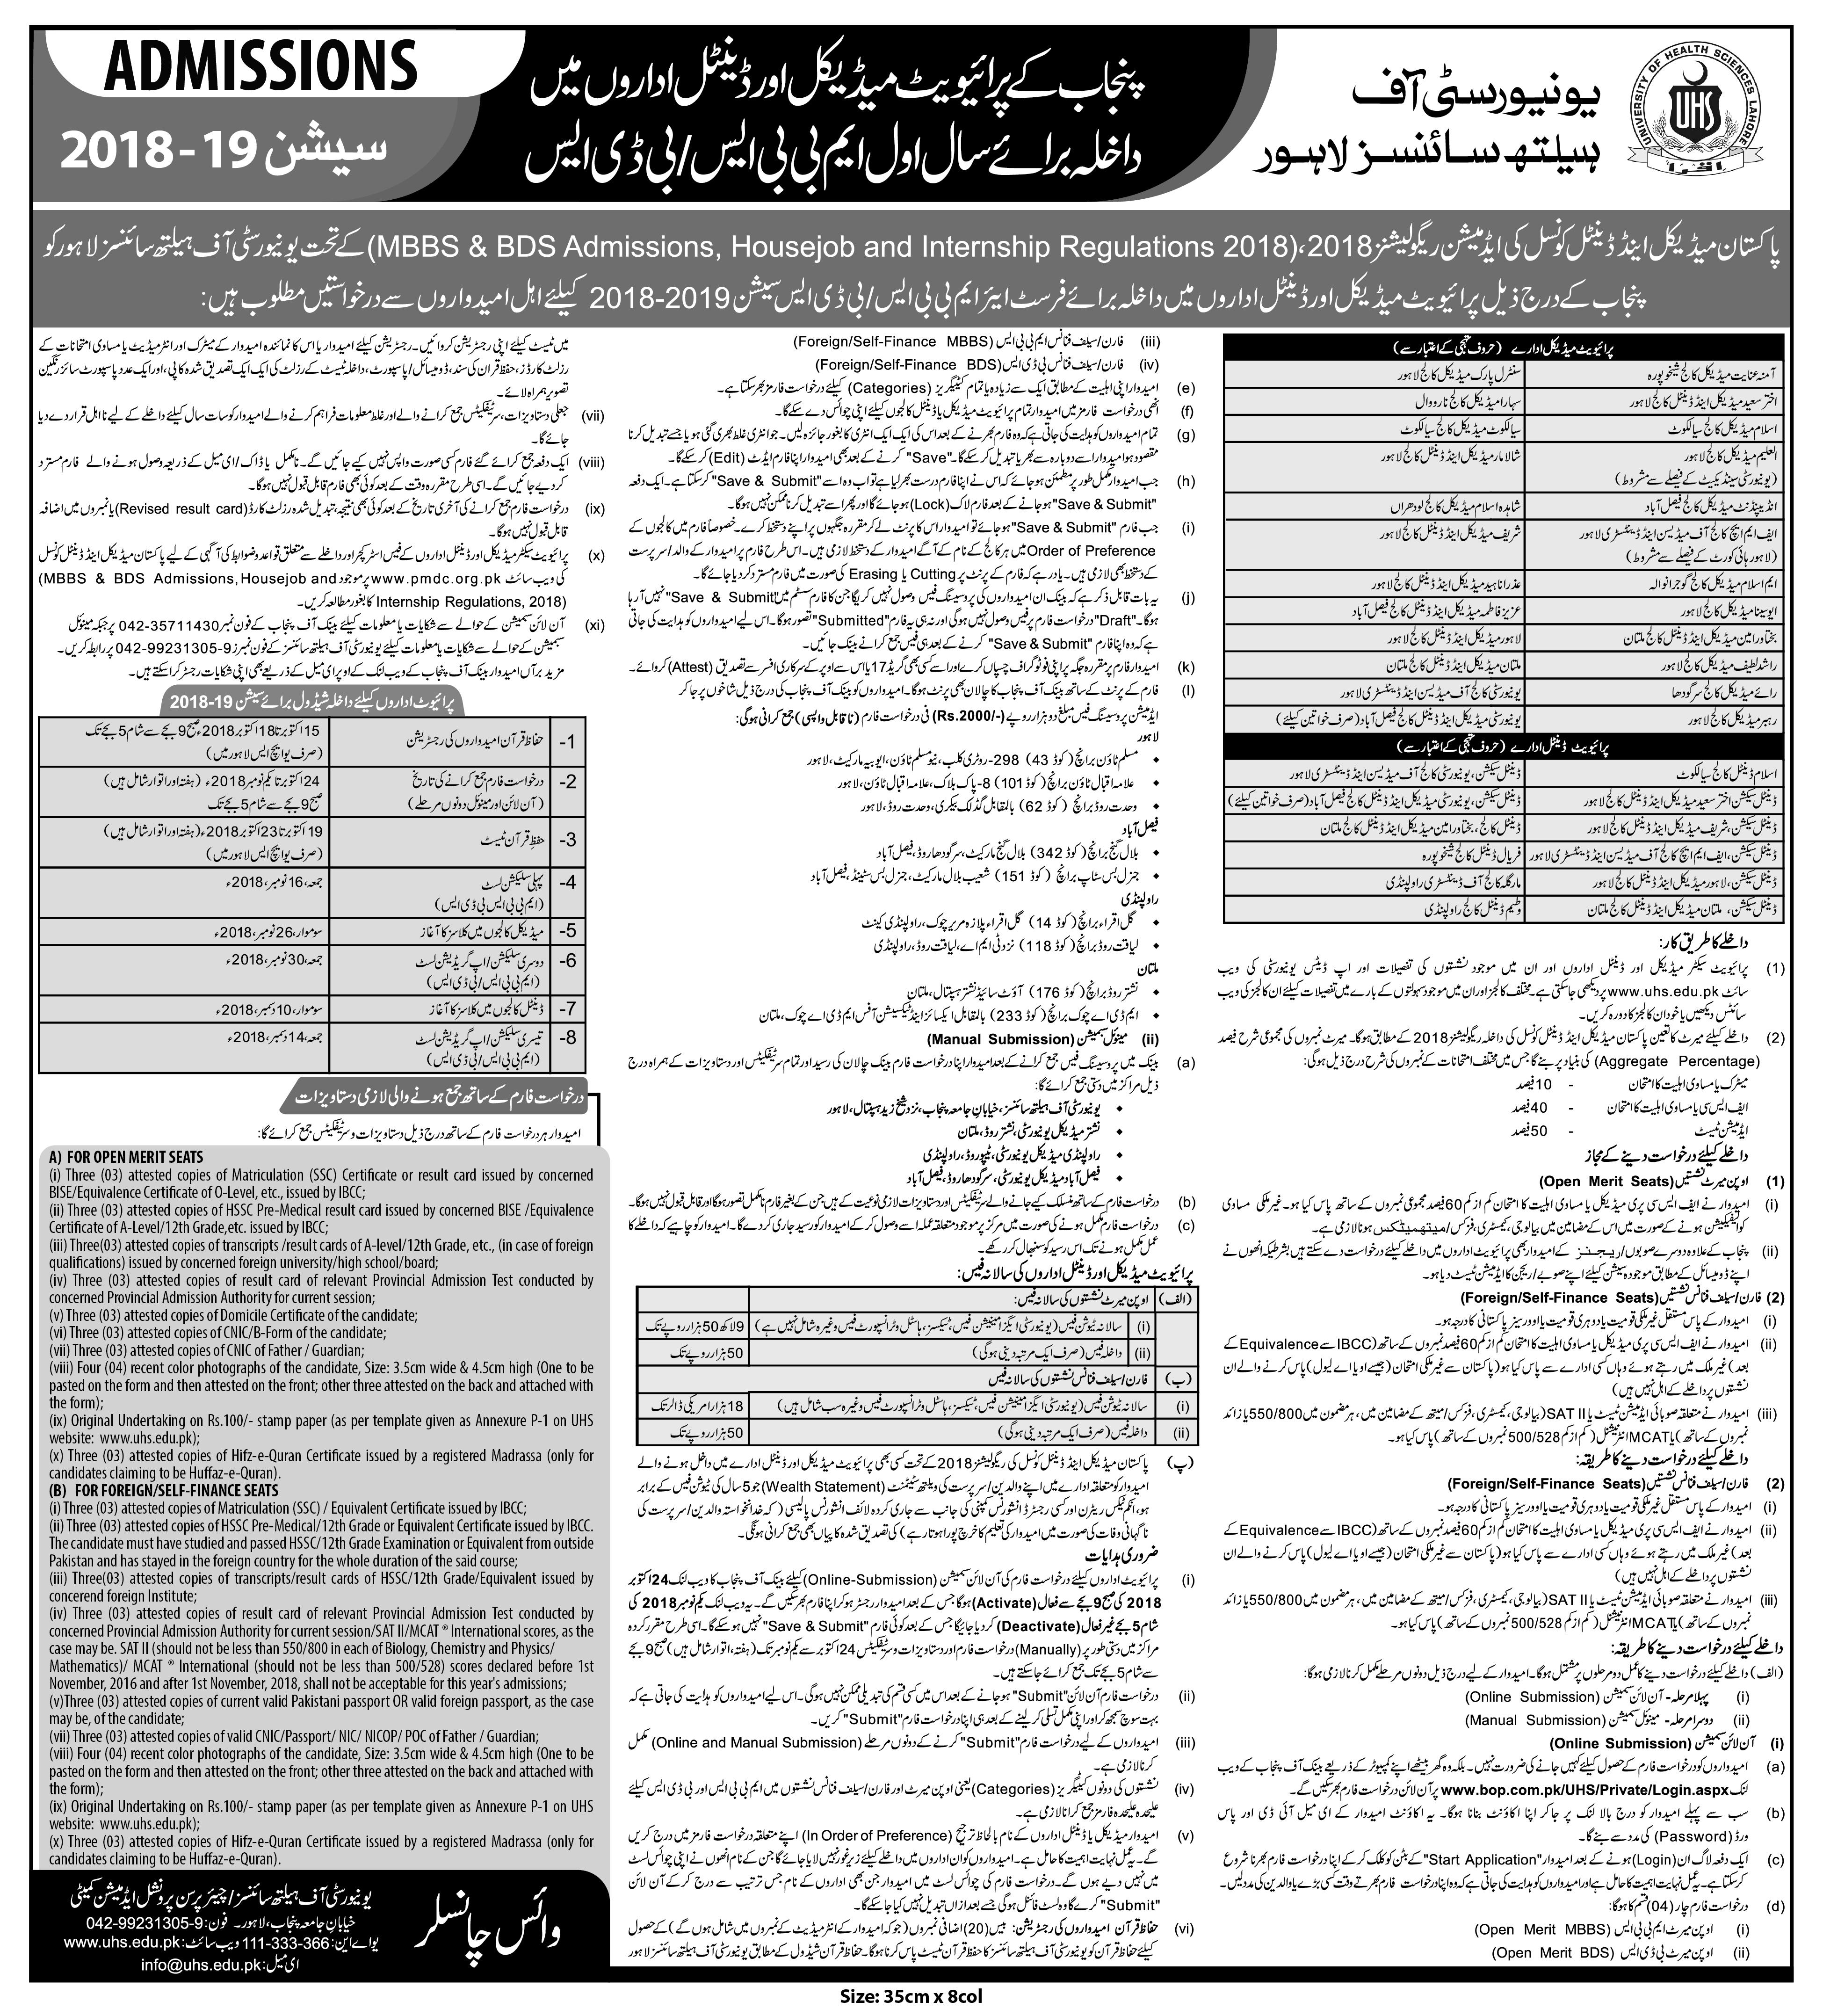 Punjab Private Medical Colleges Admission 2018